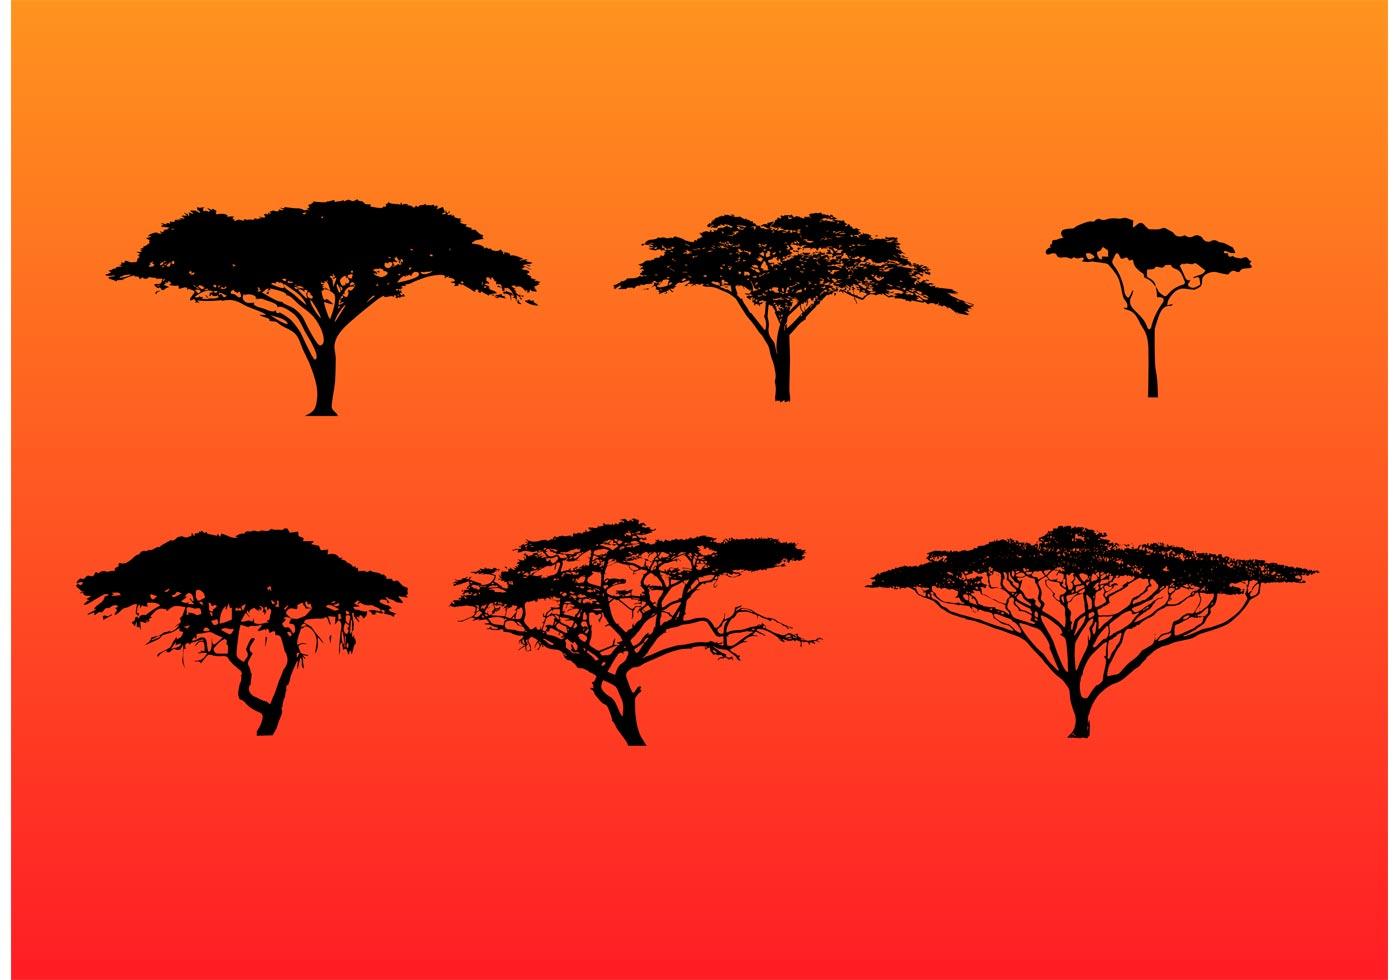 Acacia Tree Silhouette Free Vector Art.